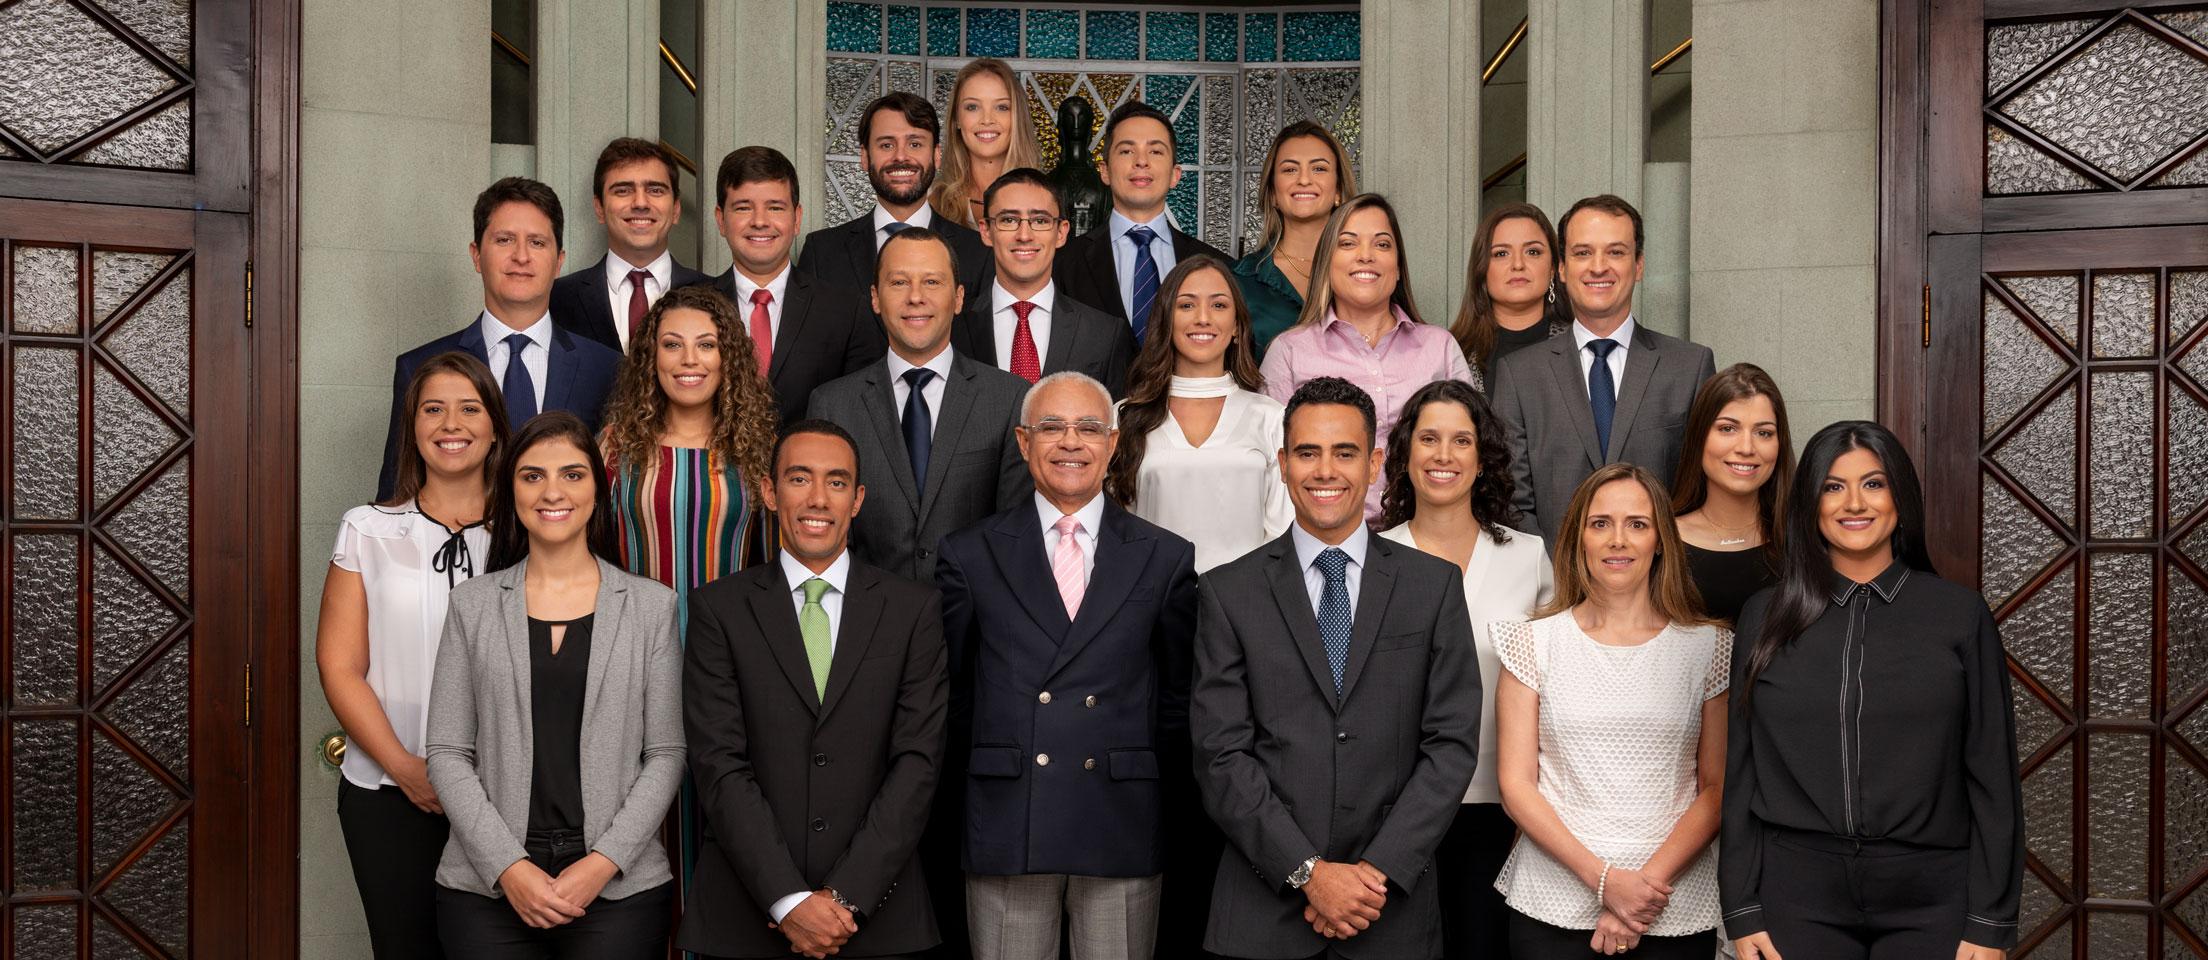 equipe-jasa-advocacia-3